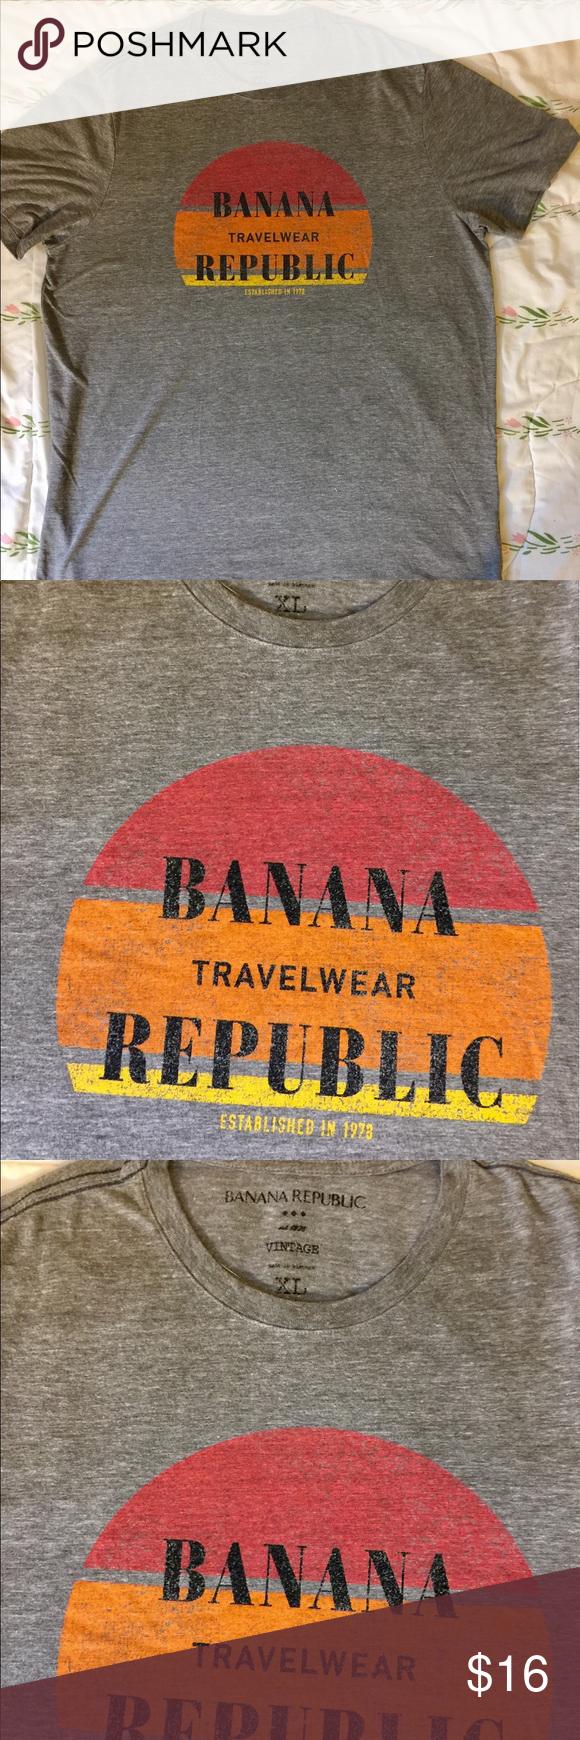 Banana Republic Men's Vintage T-Shirt XL Gray Banana Republic Men's Vintage T-Shirt XL Color Gray Banana Republic Shirts Tees - Short Sleeve